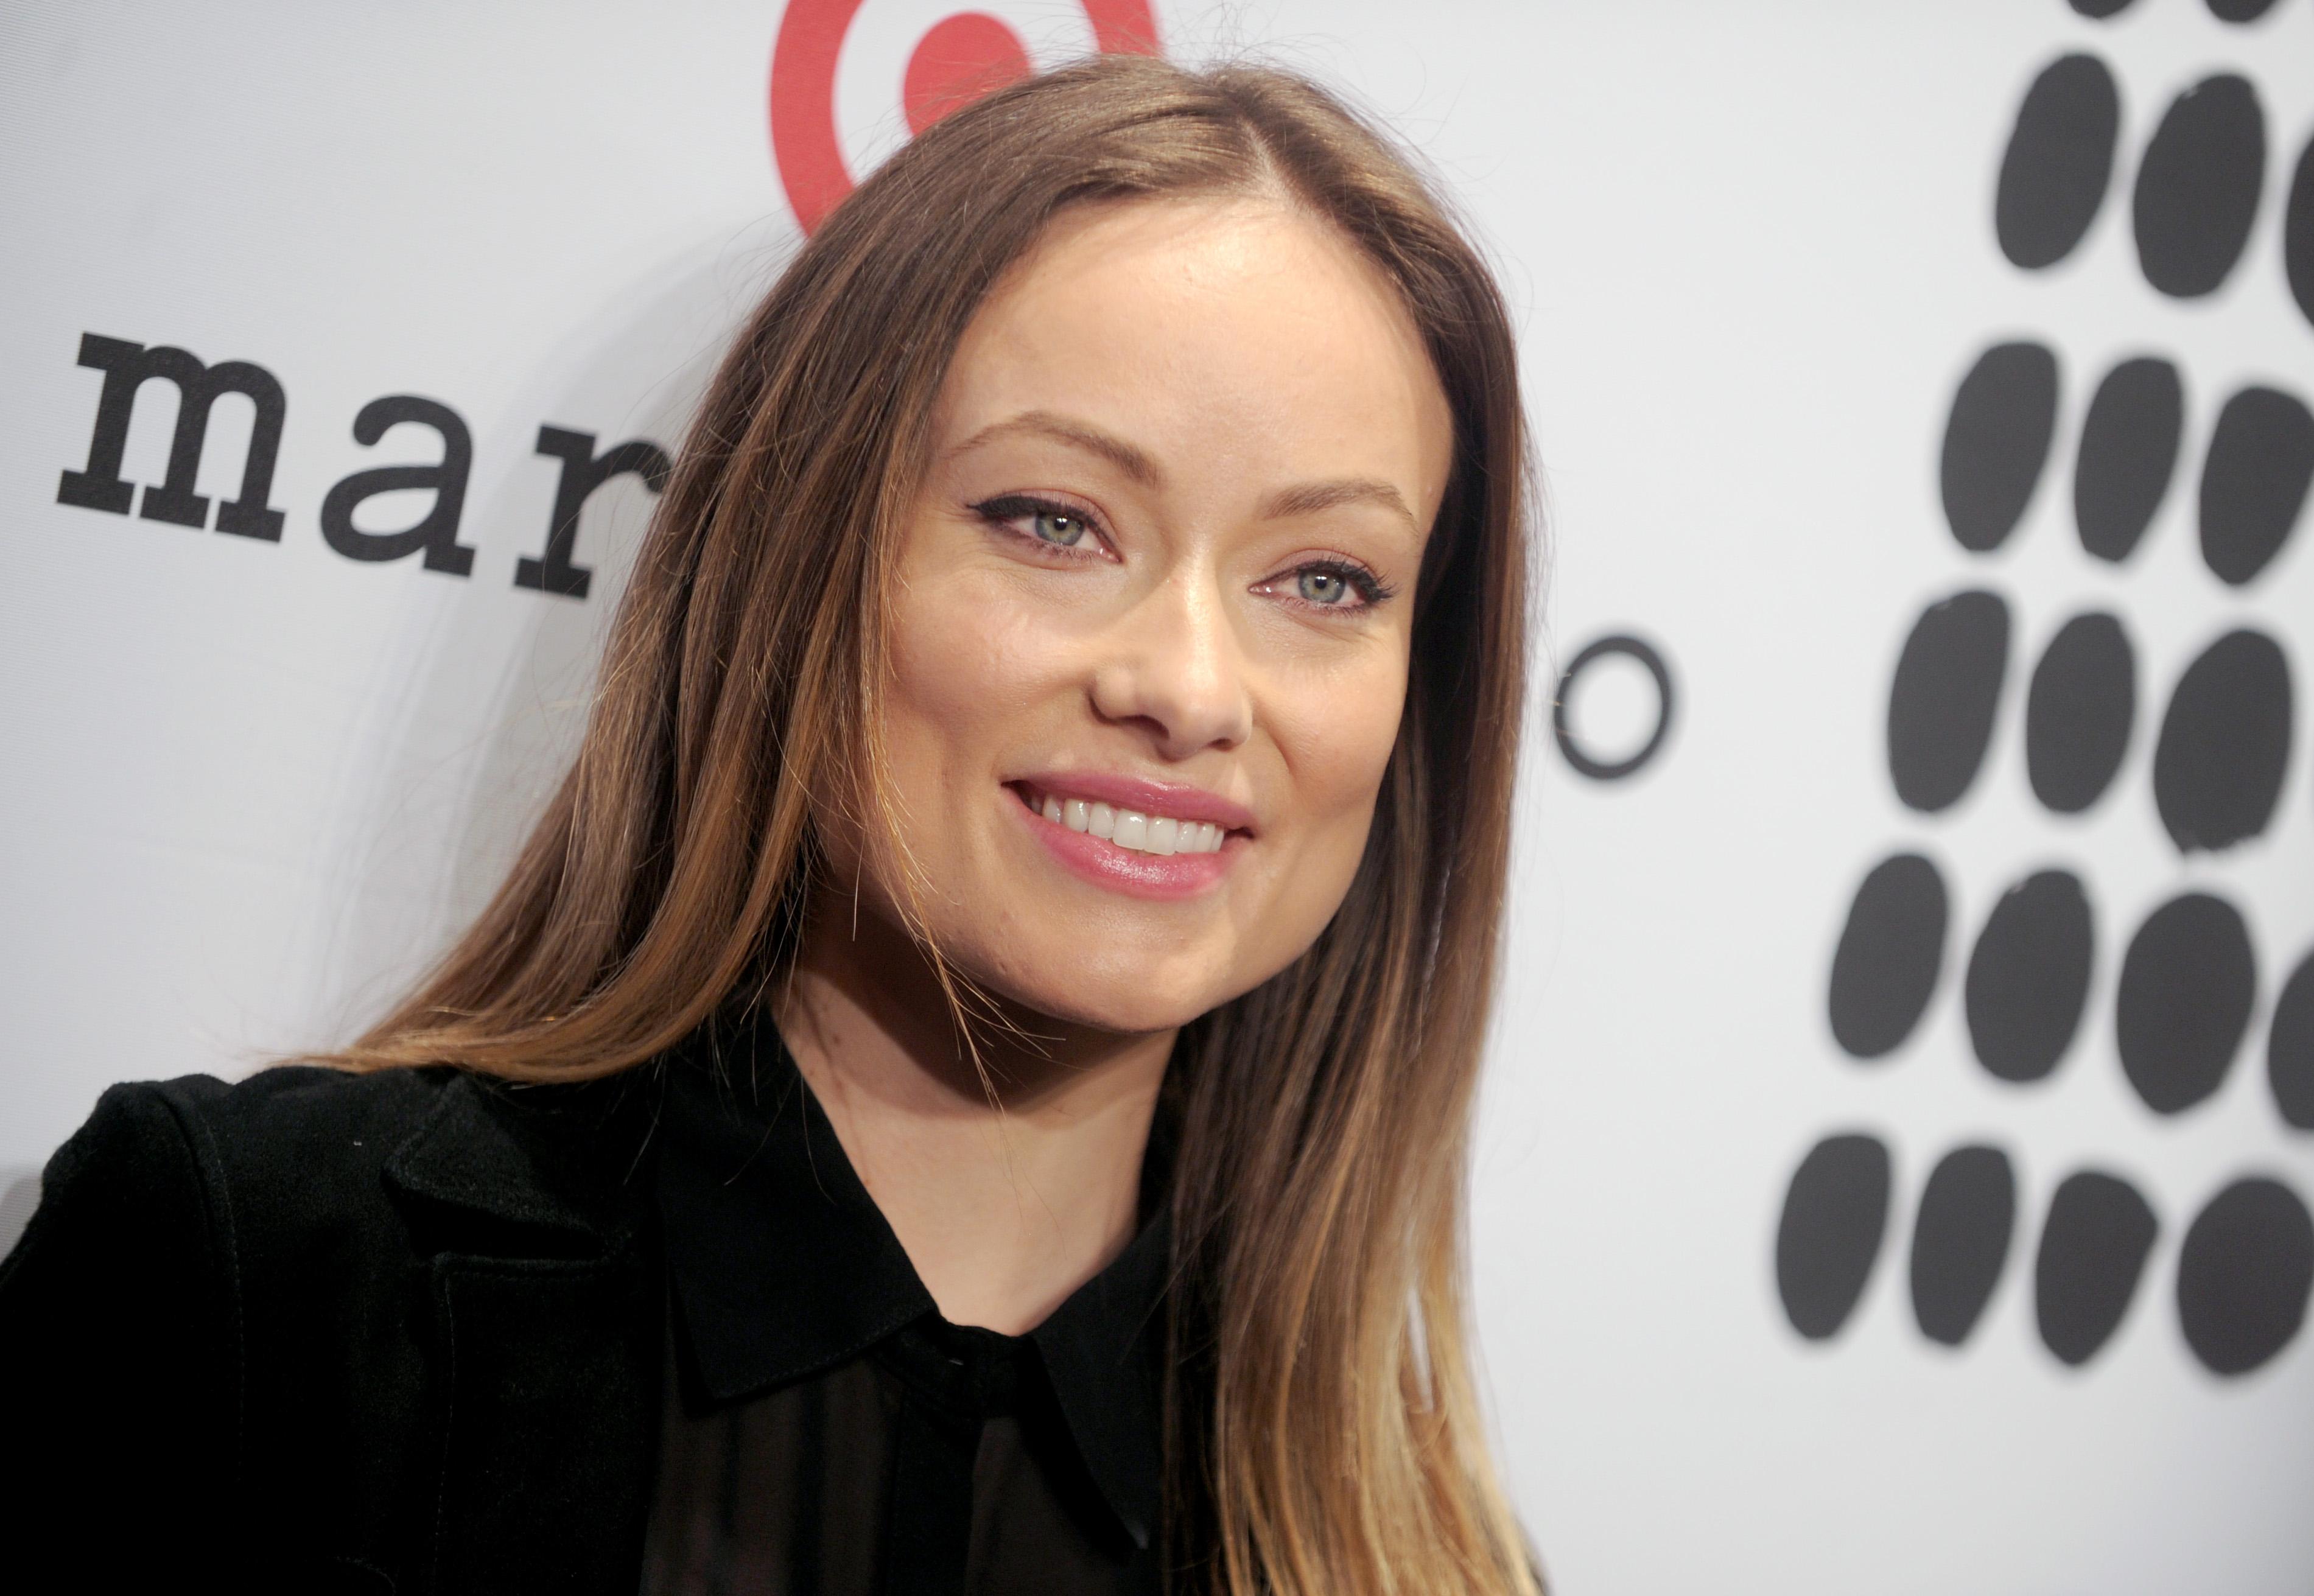 people news olivia wilde actrice change coiffure pour plus ressembler melania trump